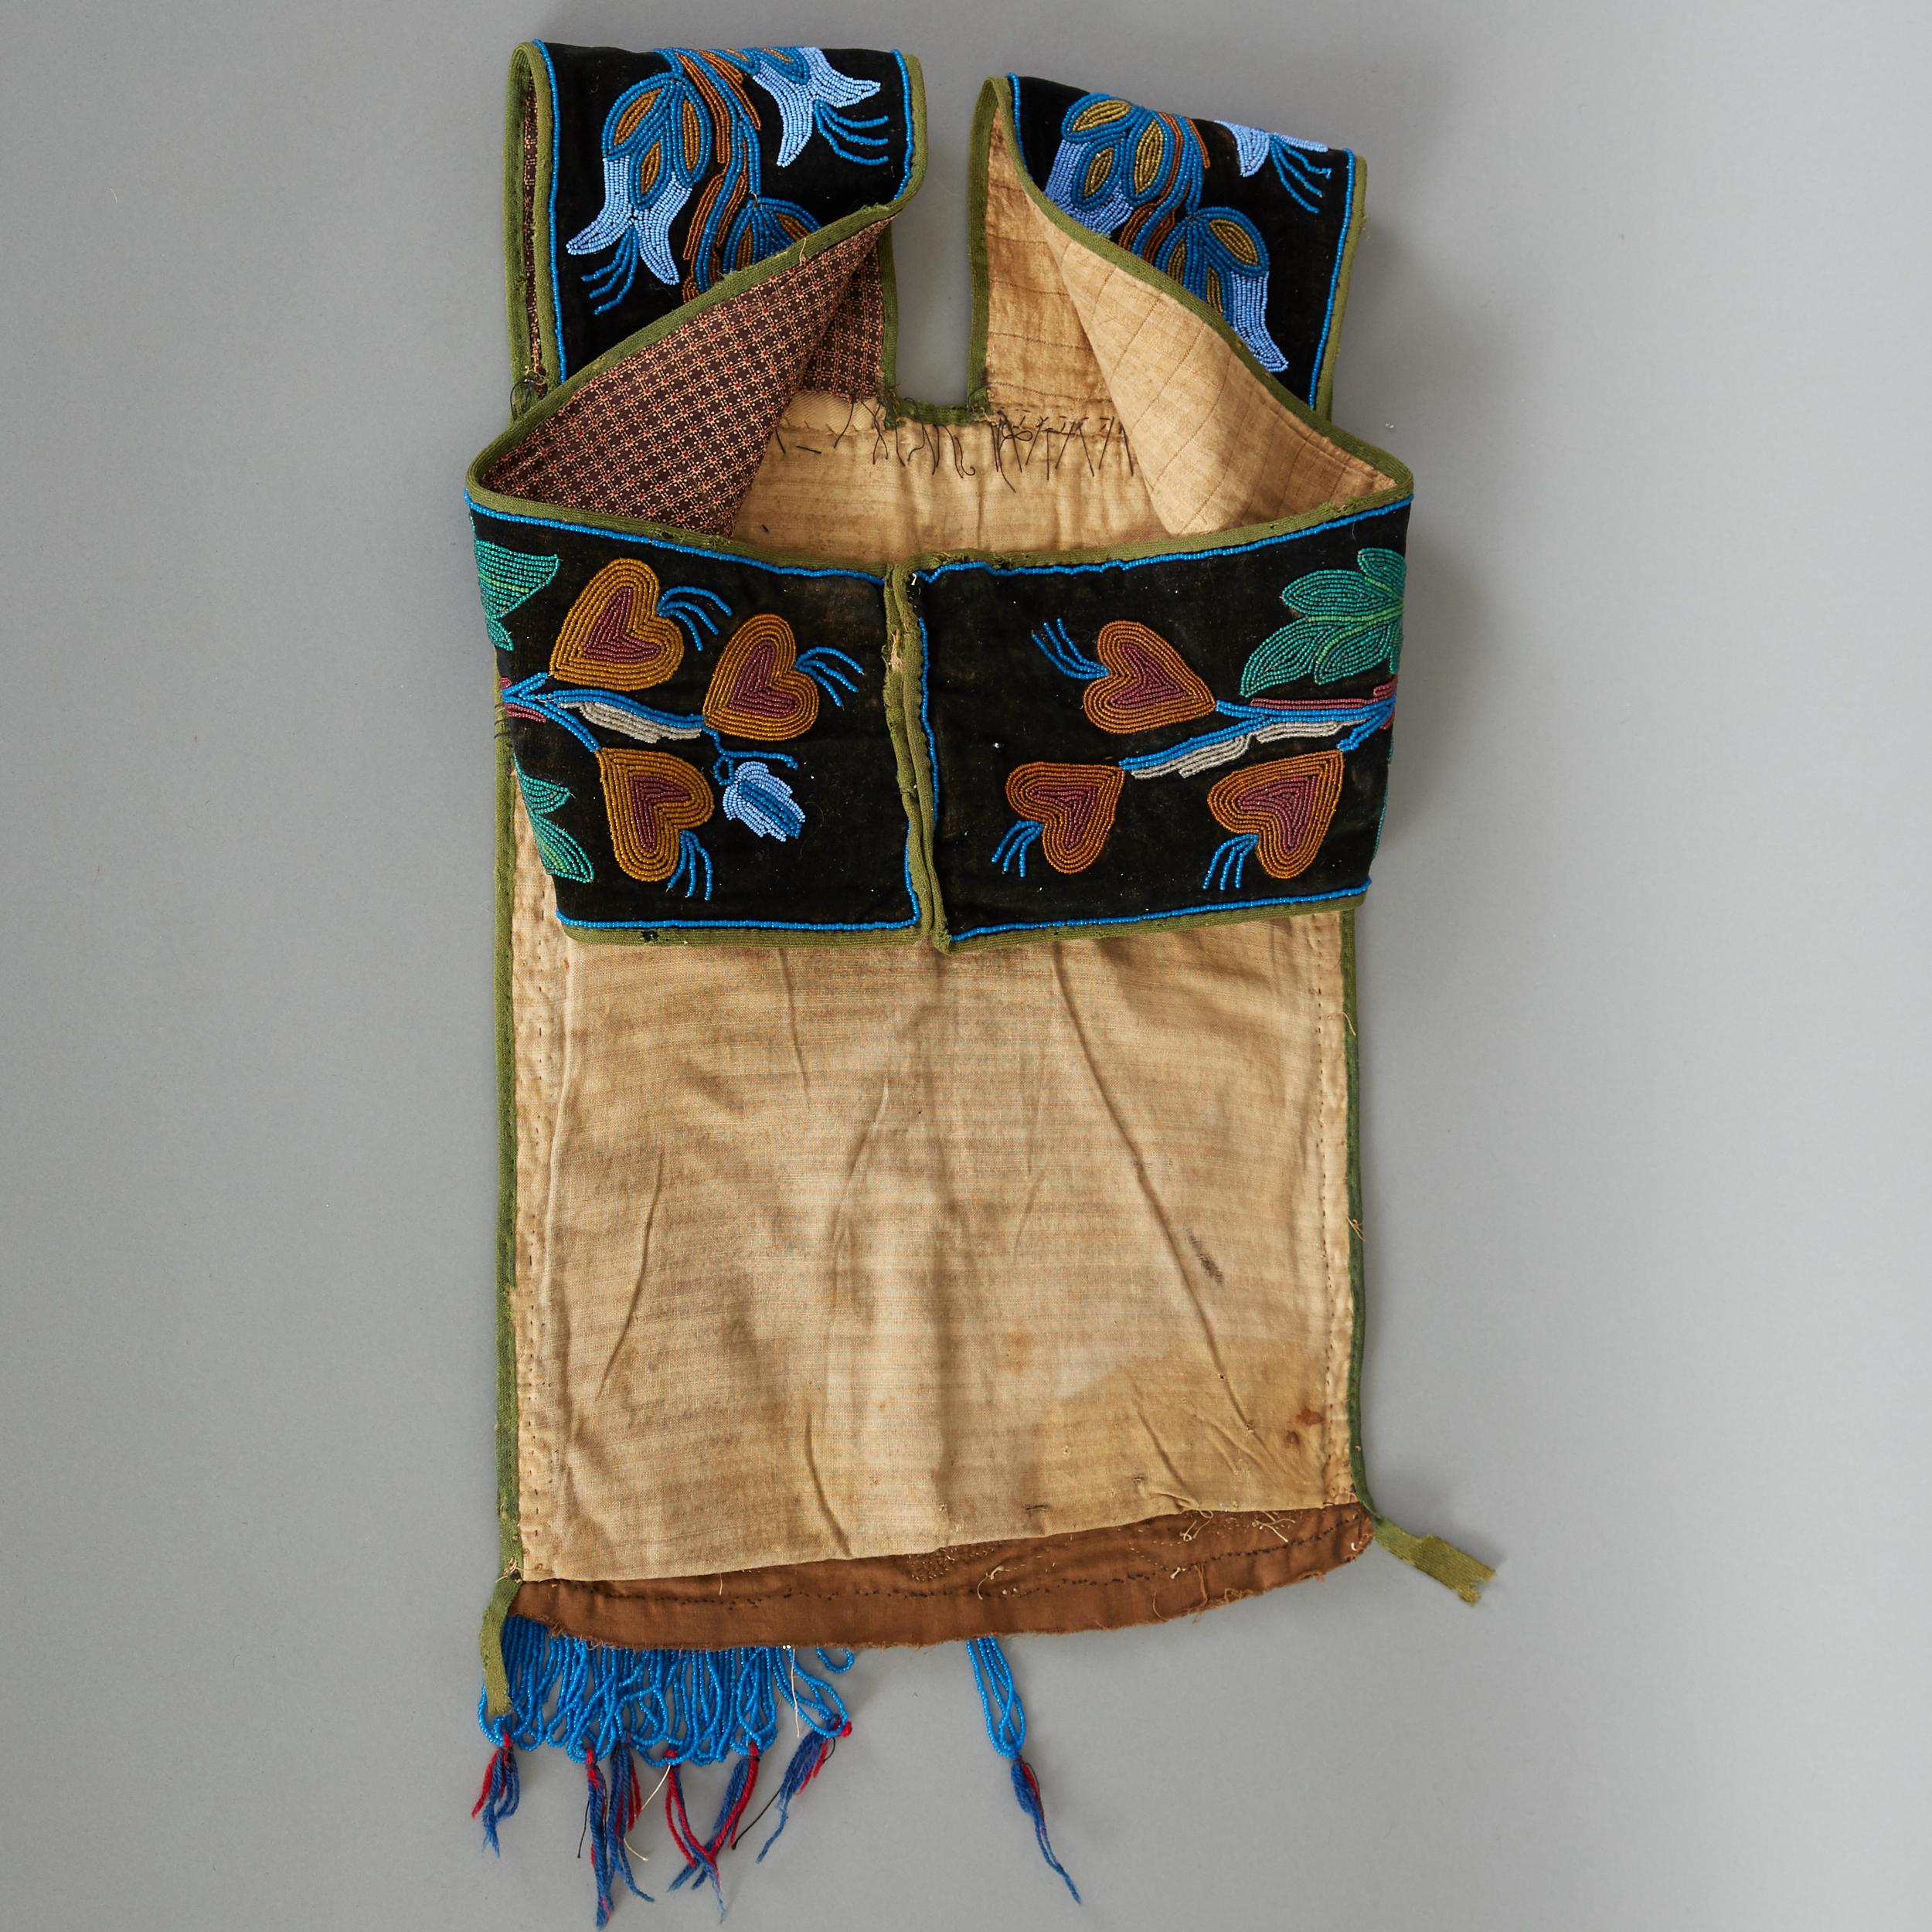 Lot 263 - Ojibwe Beaded Bandolier Bag Late 19th c.